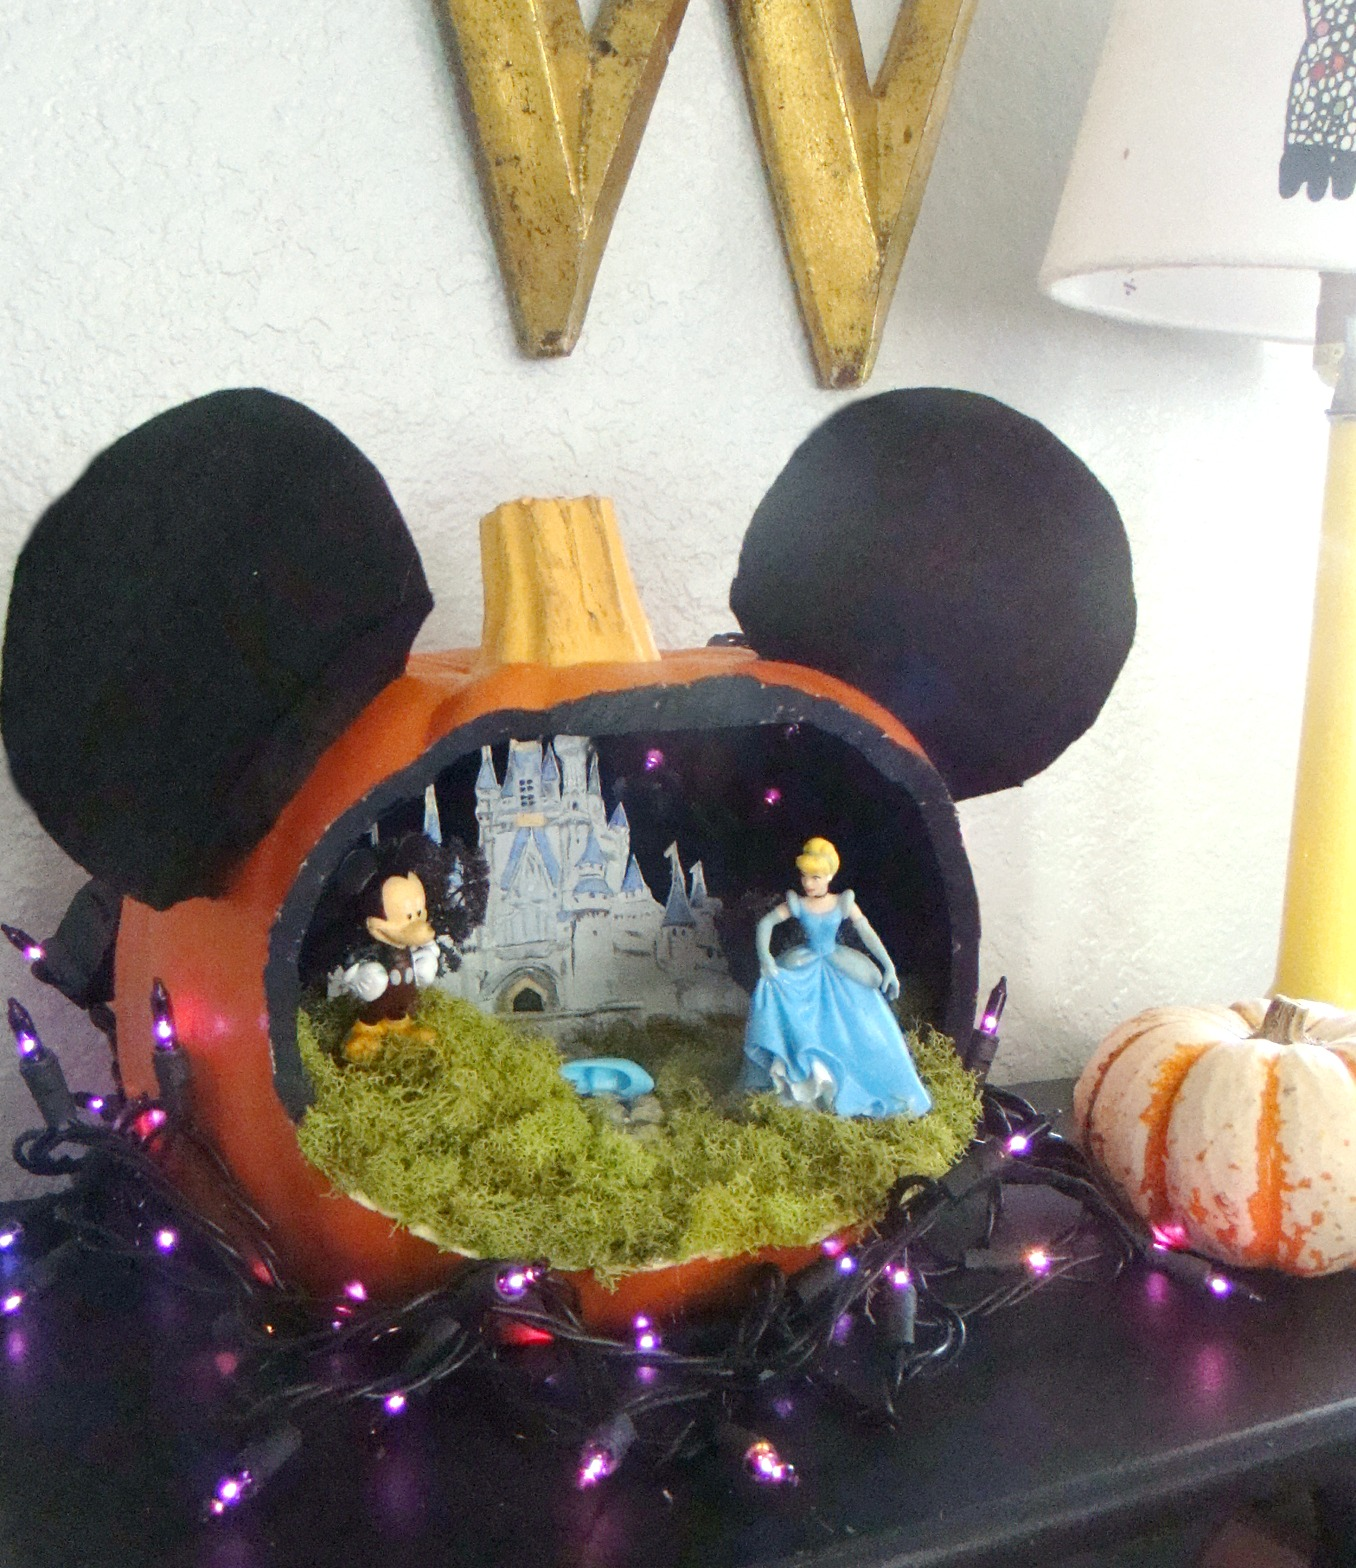 Southern Bluebird Day: Disney World Inspired Pumpkin Diorama